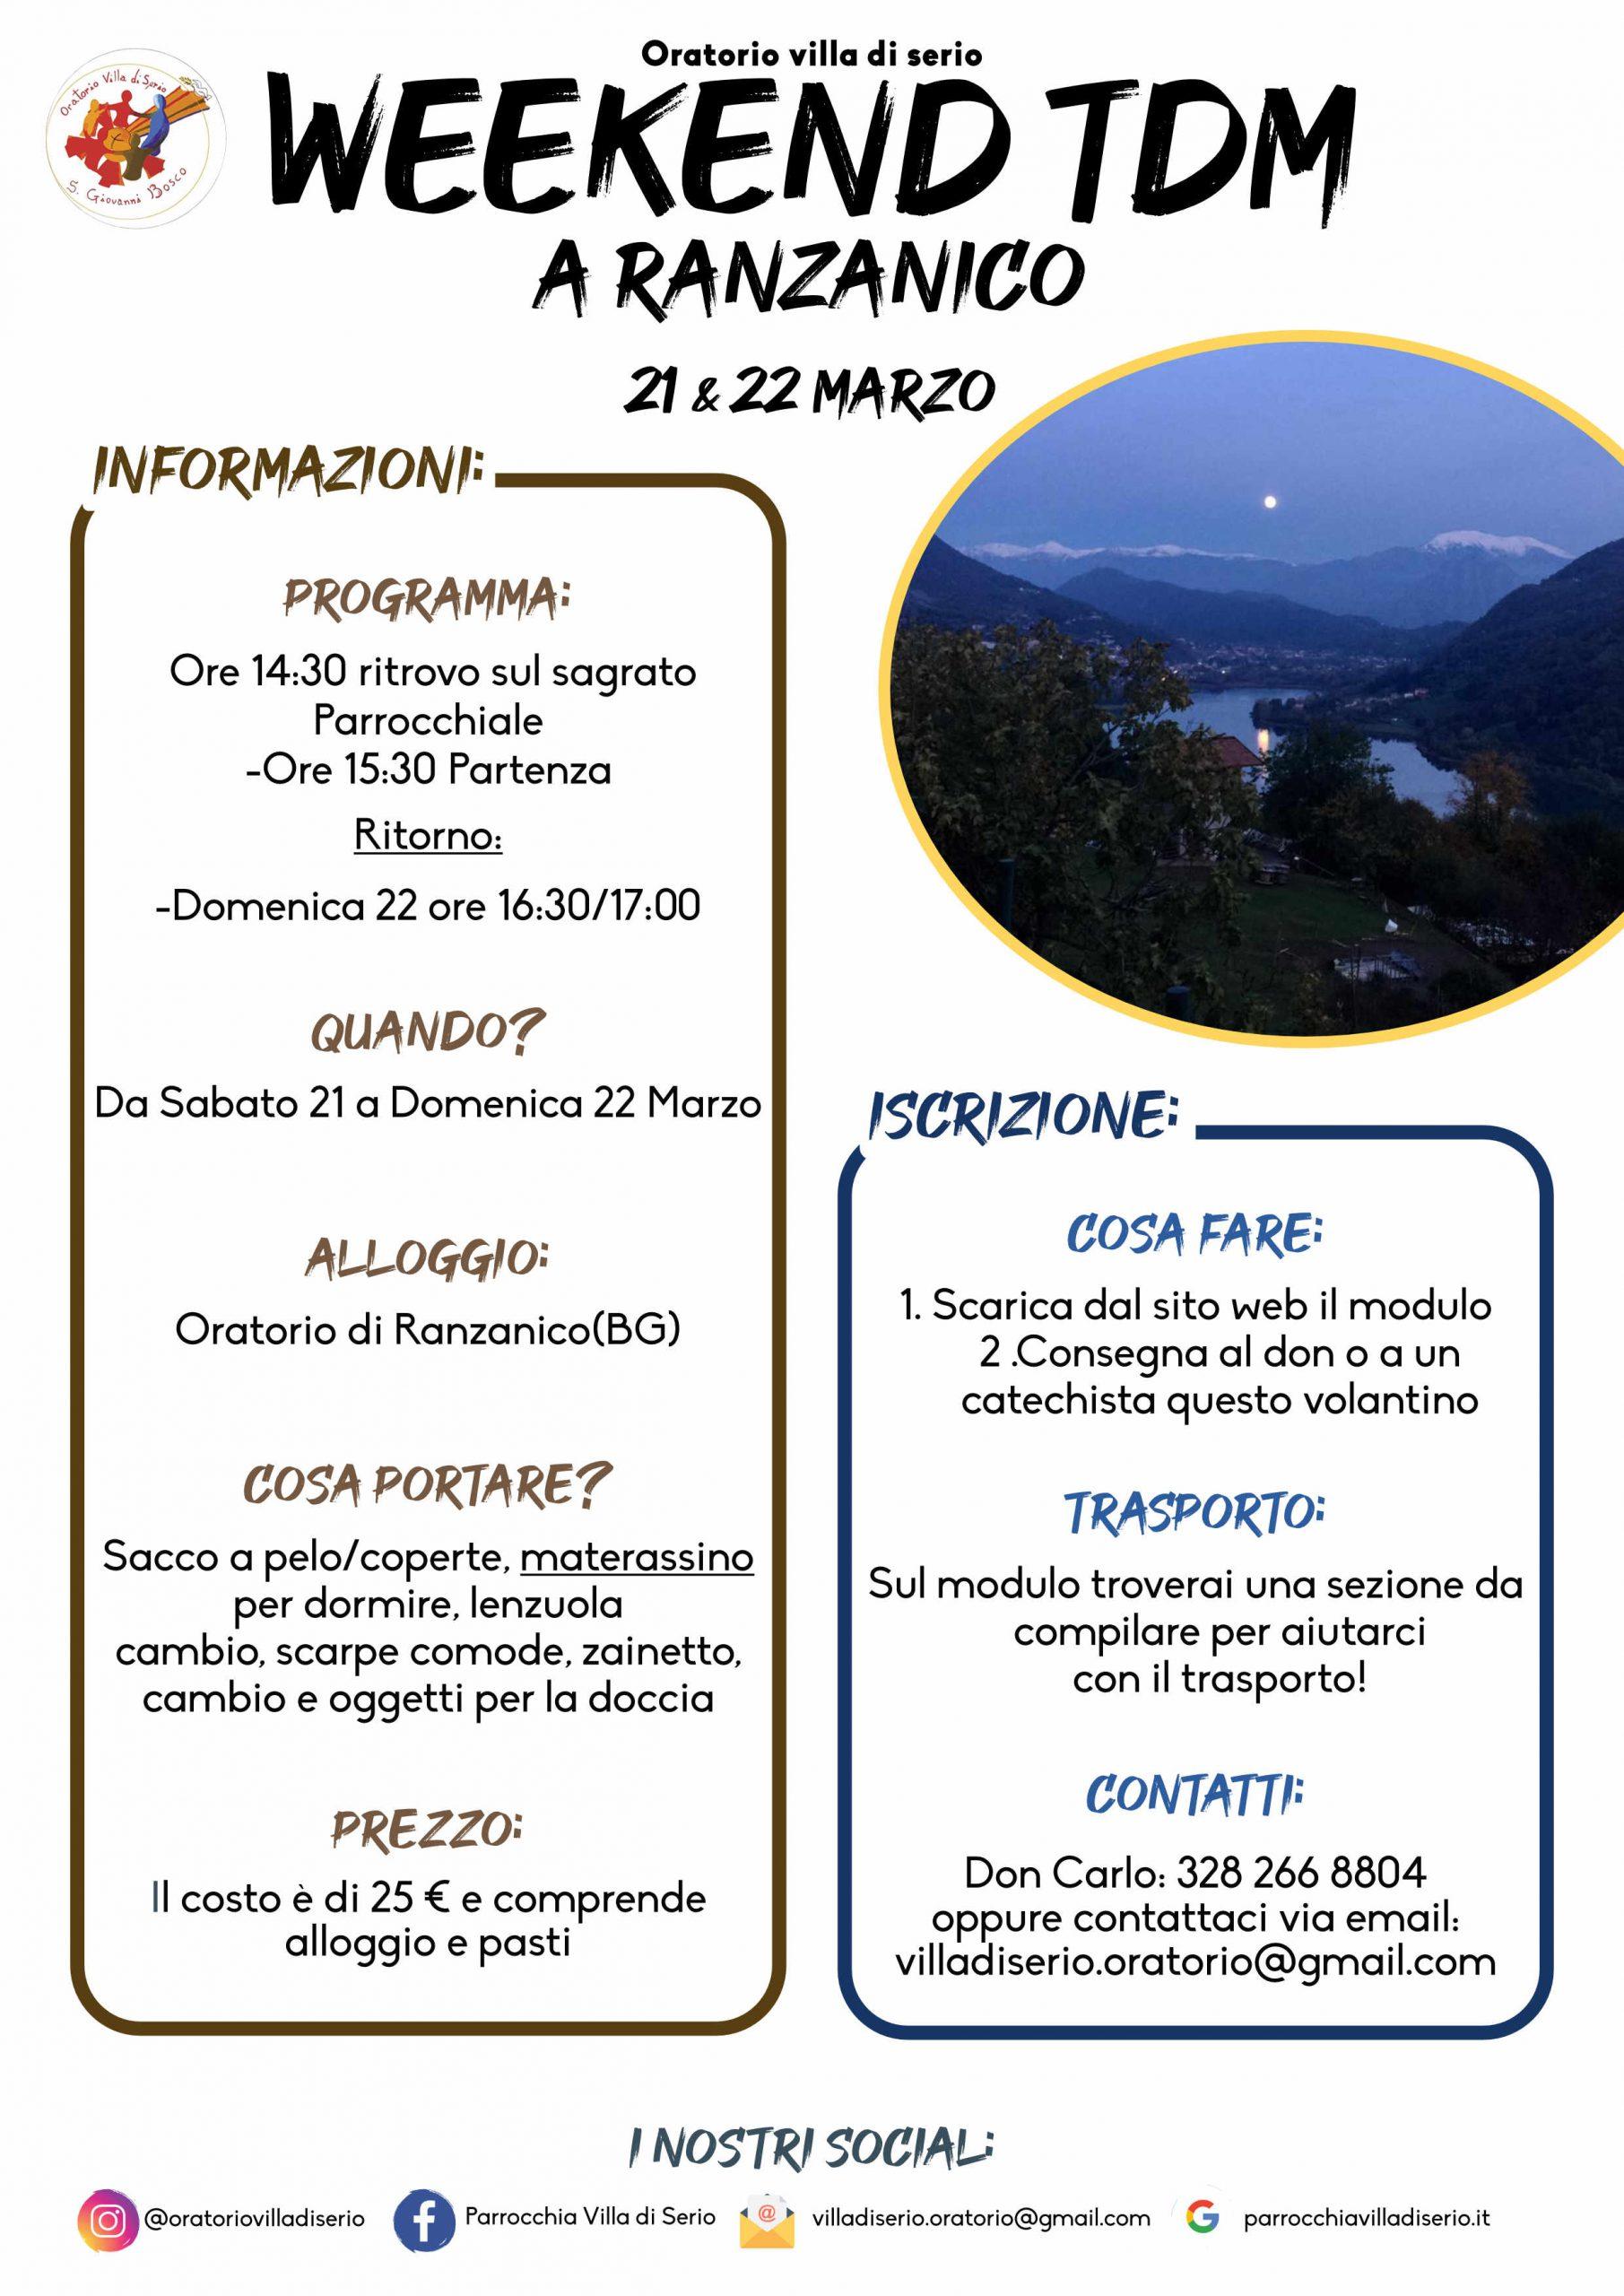 Weekend TDM – Ranzanico 2020